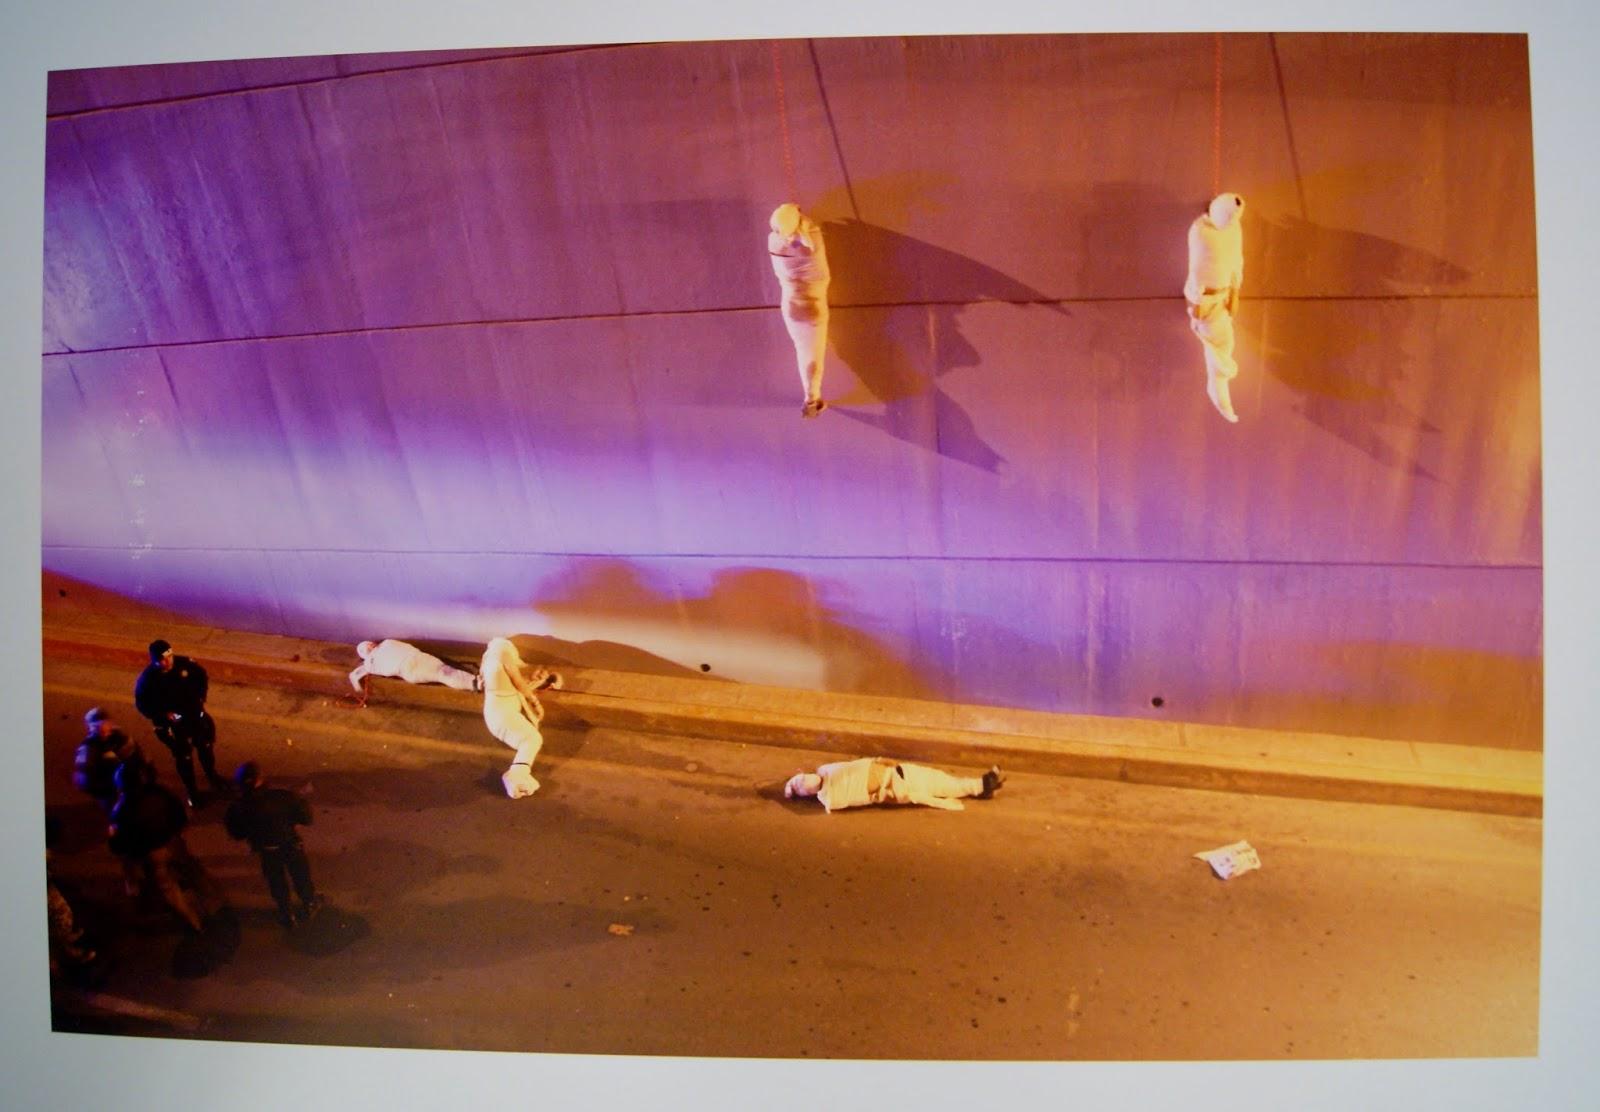 World Press Photo Contest Exhibit in Toronto, Photography, Art, Artmatters, culture, global, ontario, canada, the purple scarf, melanieps, brookfield place, allan lambert galleria, Police, cartel, executions, mexico, third prize, contemporary issues singles, christopher vanegas, bodies, la vanguardia, el guardian, saltillo, coahuila